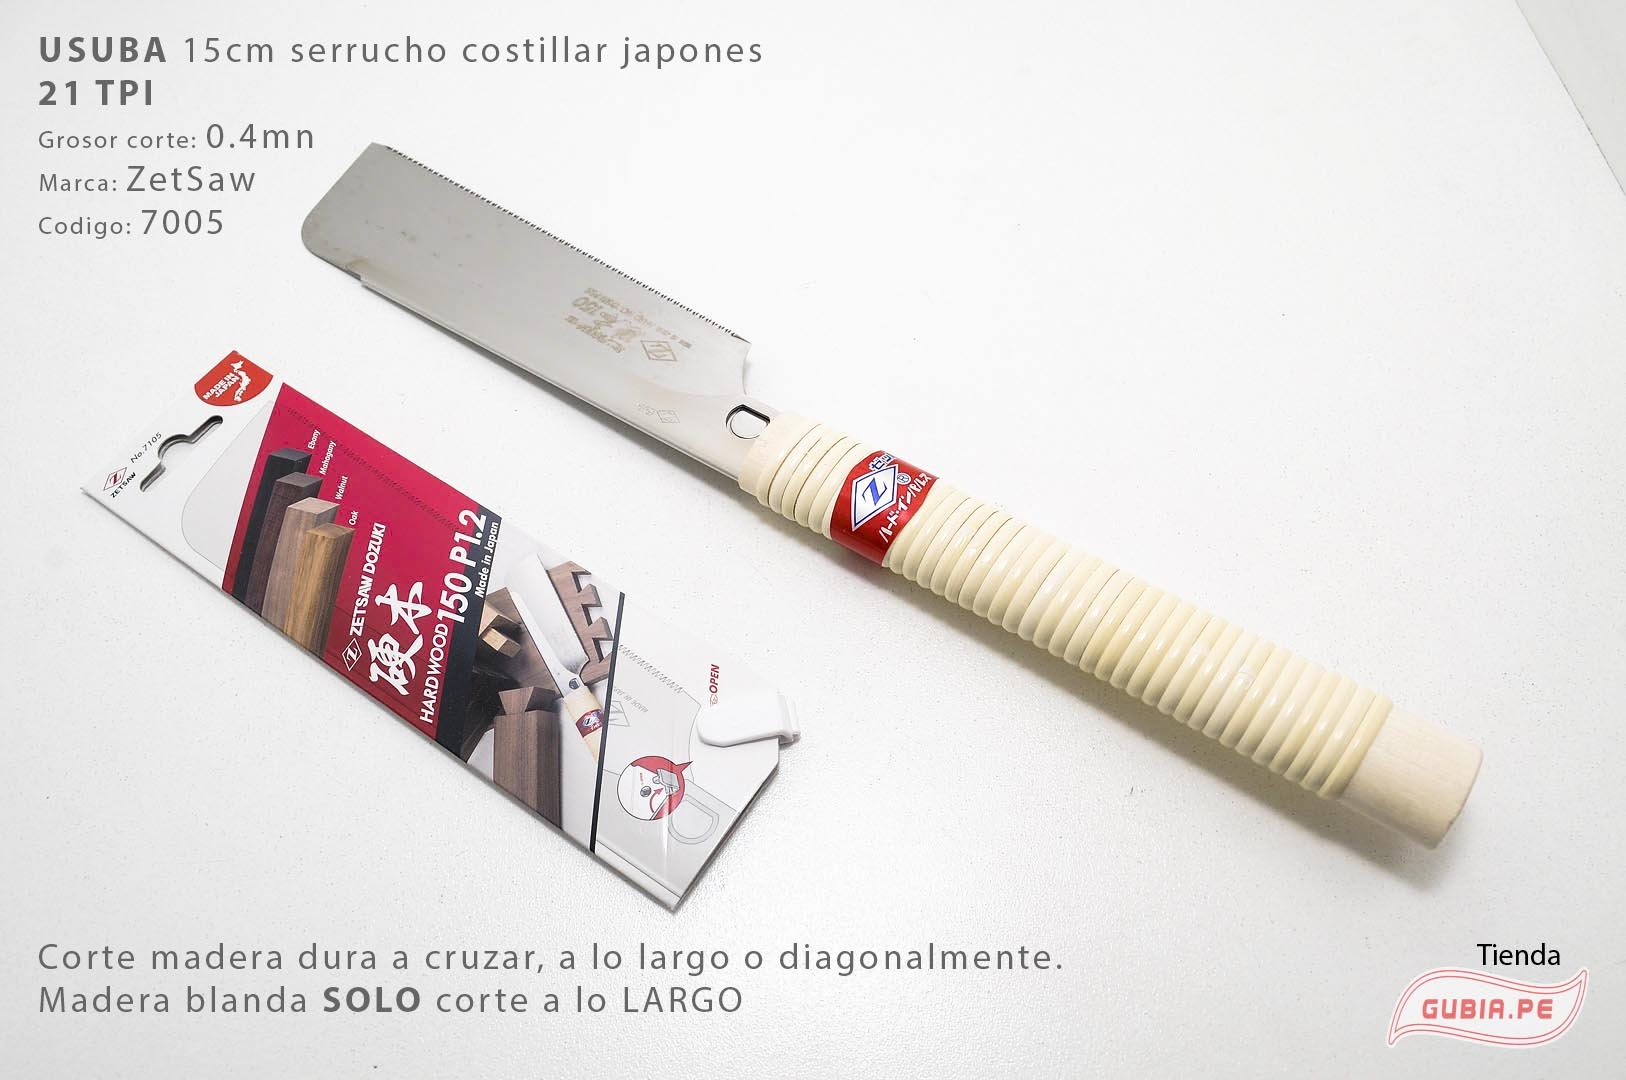 7105-Usuba madera dura 21TPI corte universal  15cm ZetSaaw 7105-max-3.